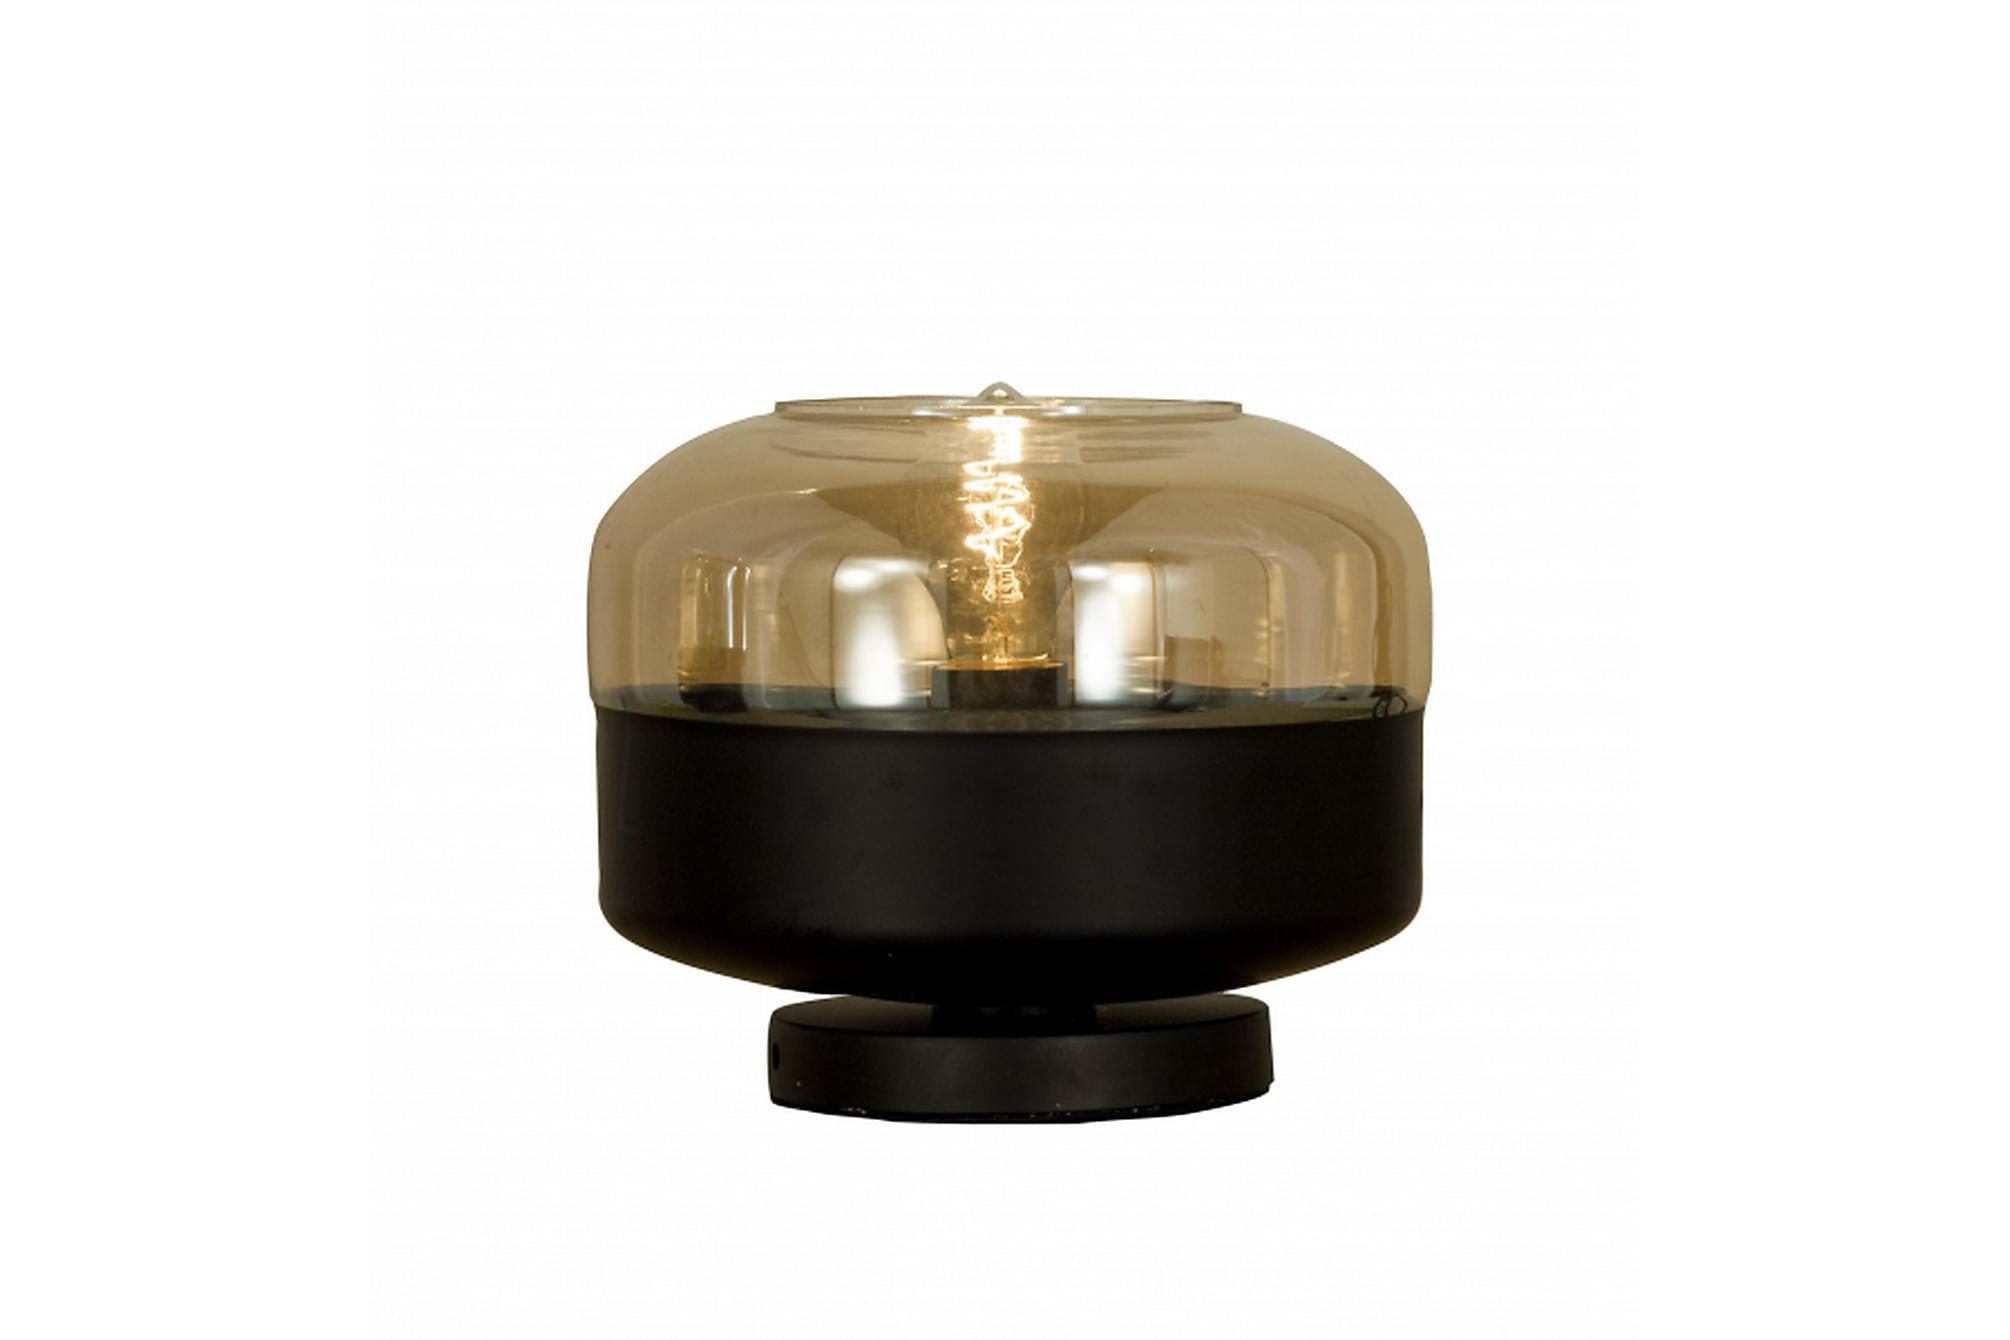 MITTE Bordslampa Svart/Amber, Bordslampor